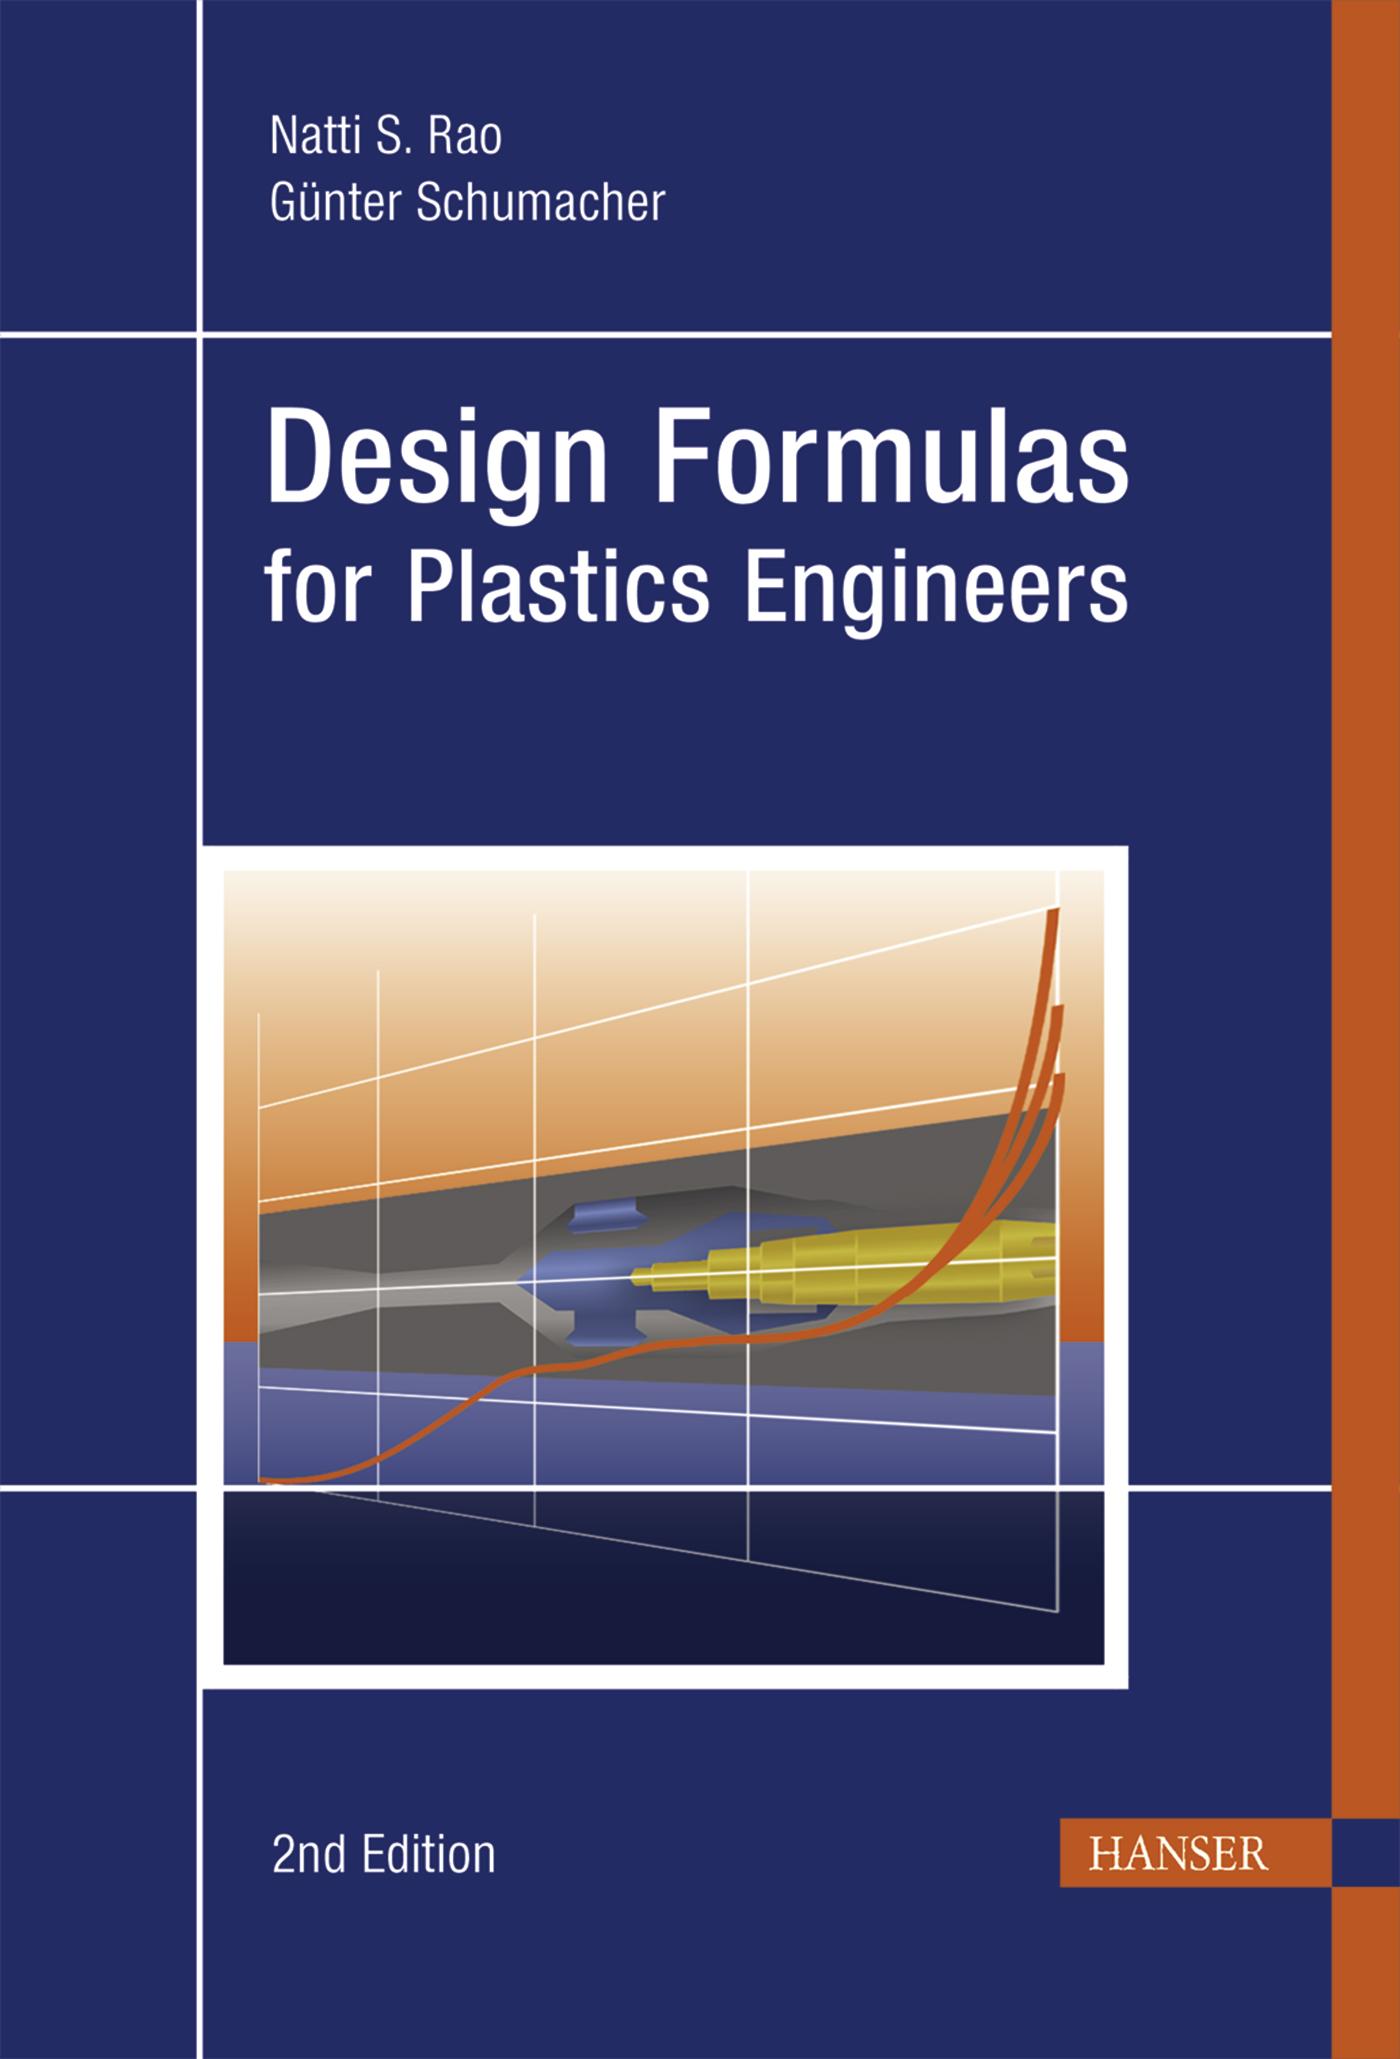 Rao, Schumacher, Design Formulas for Plastics Engineers, 978-3-446-22674-6